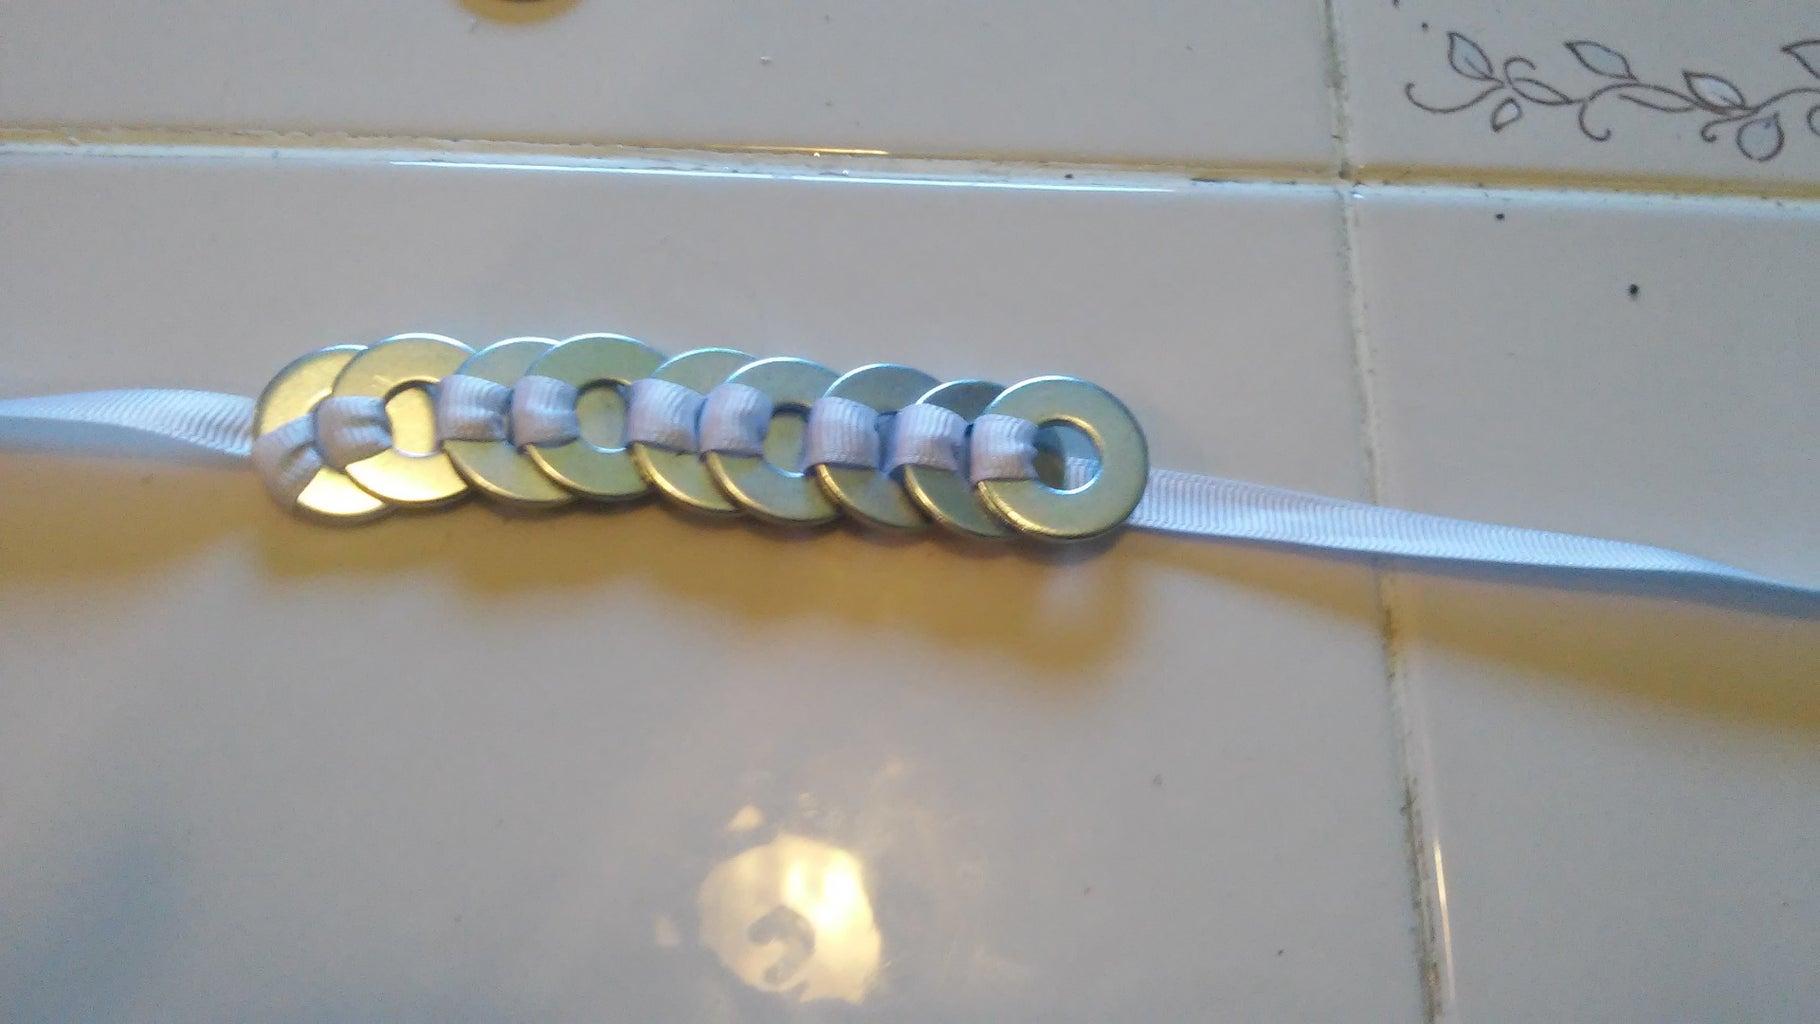 Weave Ribbon Through Washers